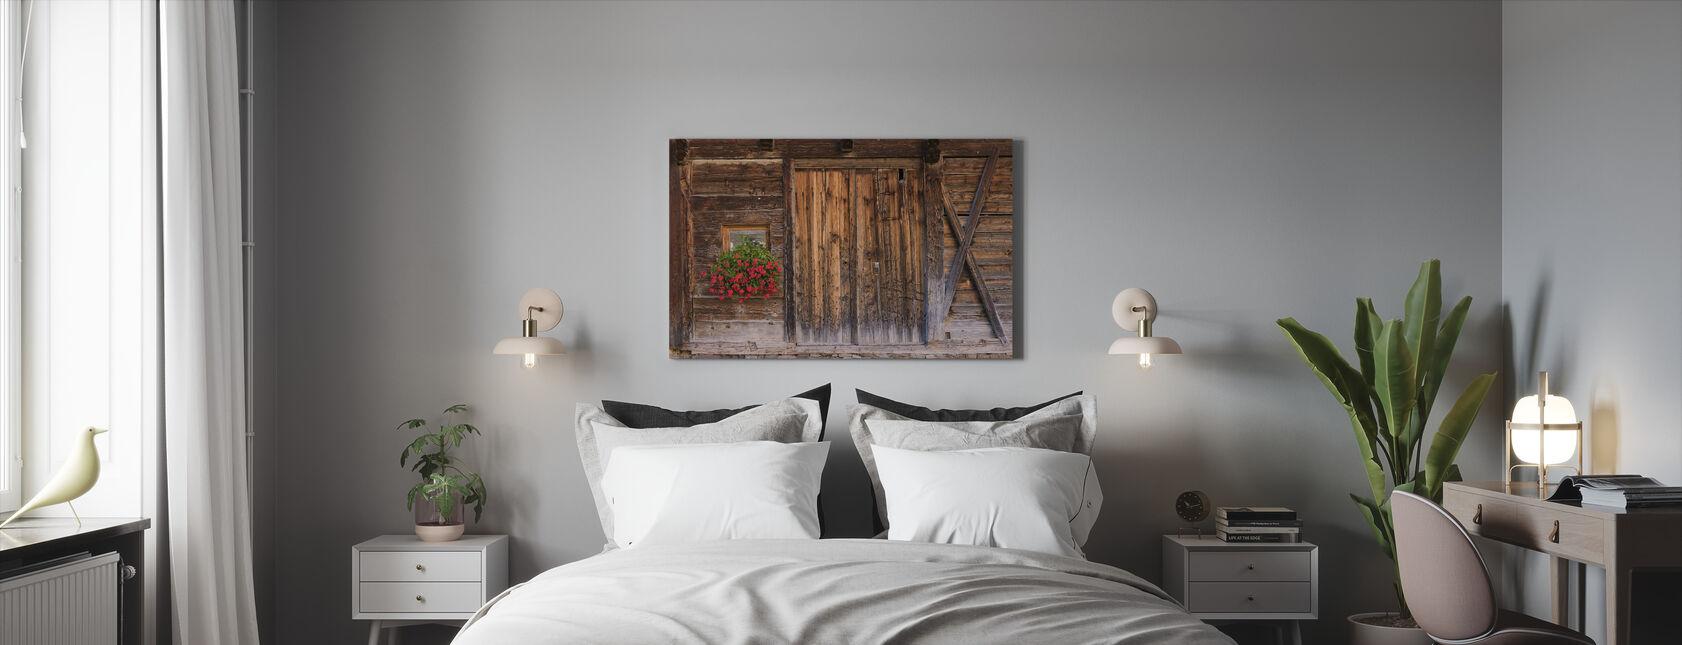 Rustic Charm - Canvas print - Bedroom